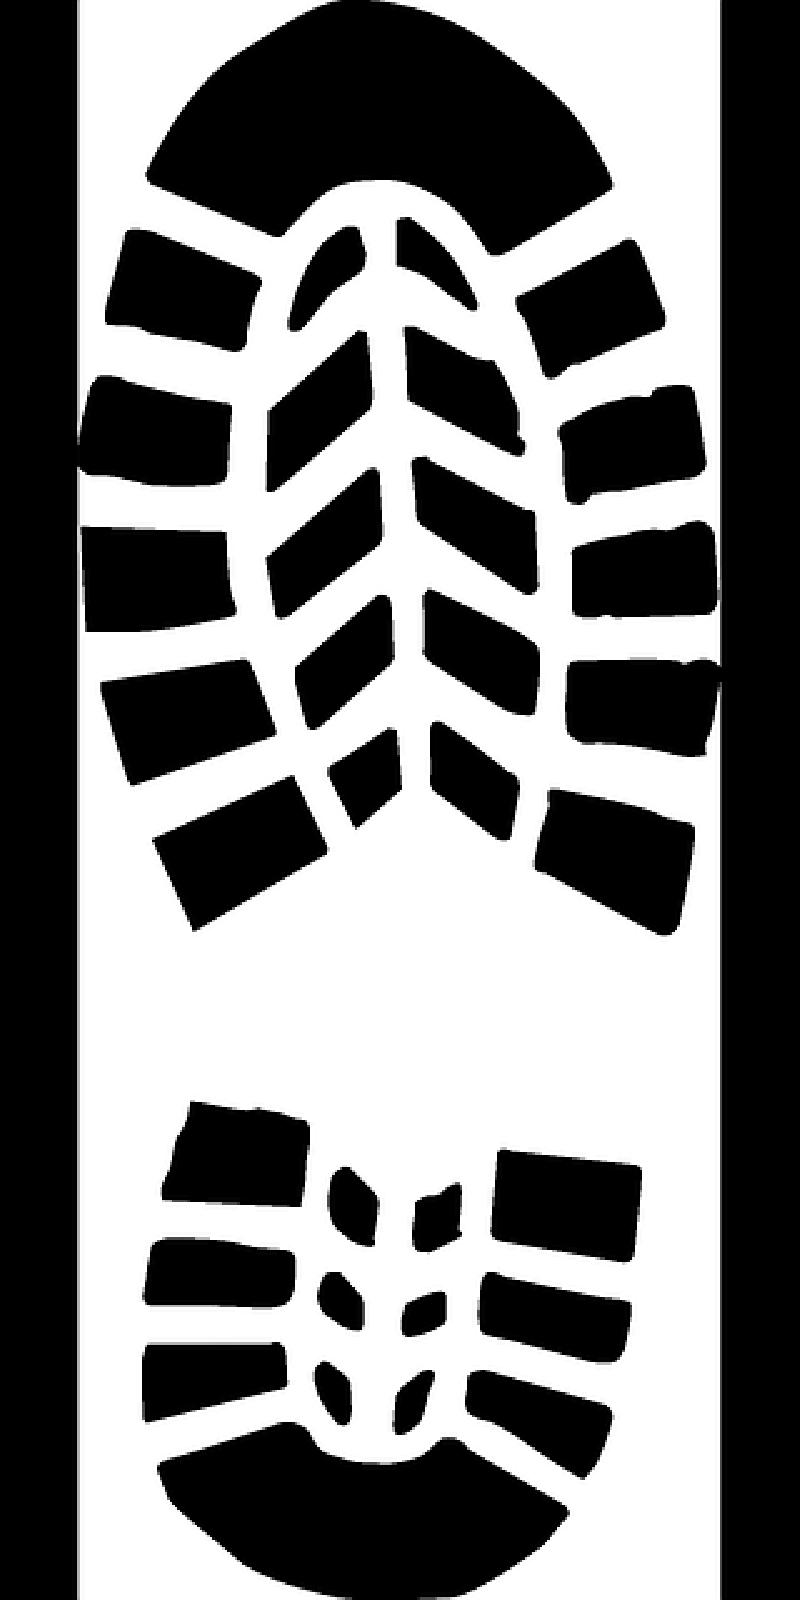 Footsteps clipart border. Footprint shoe sole pencil